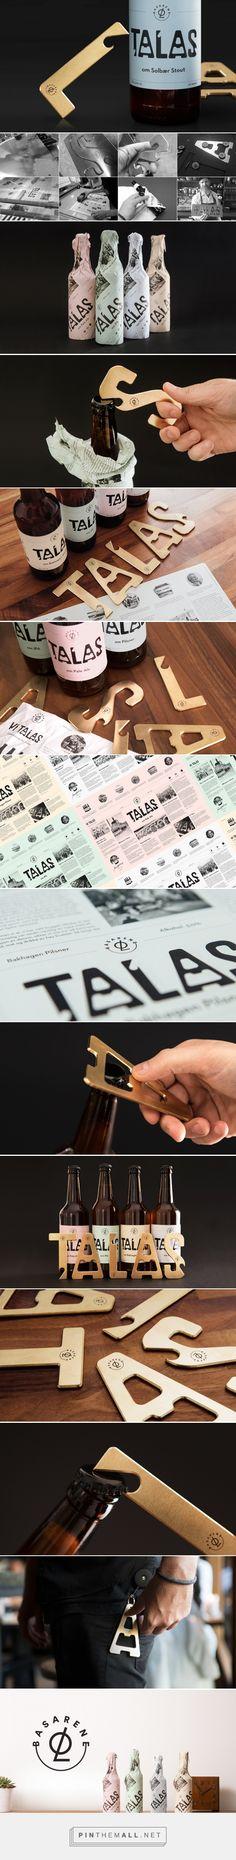 Devi Soewono | TALAS a branding project by Mats Ottdal & Anti. http://www.devisoewono.com/design/talas/